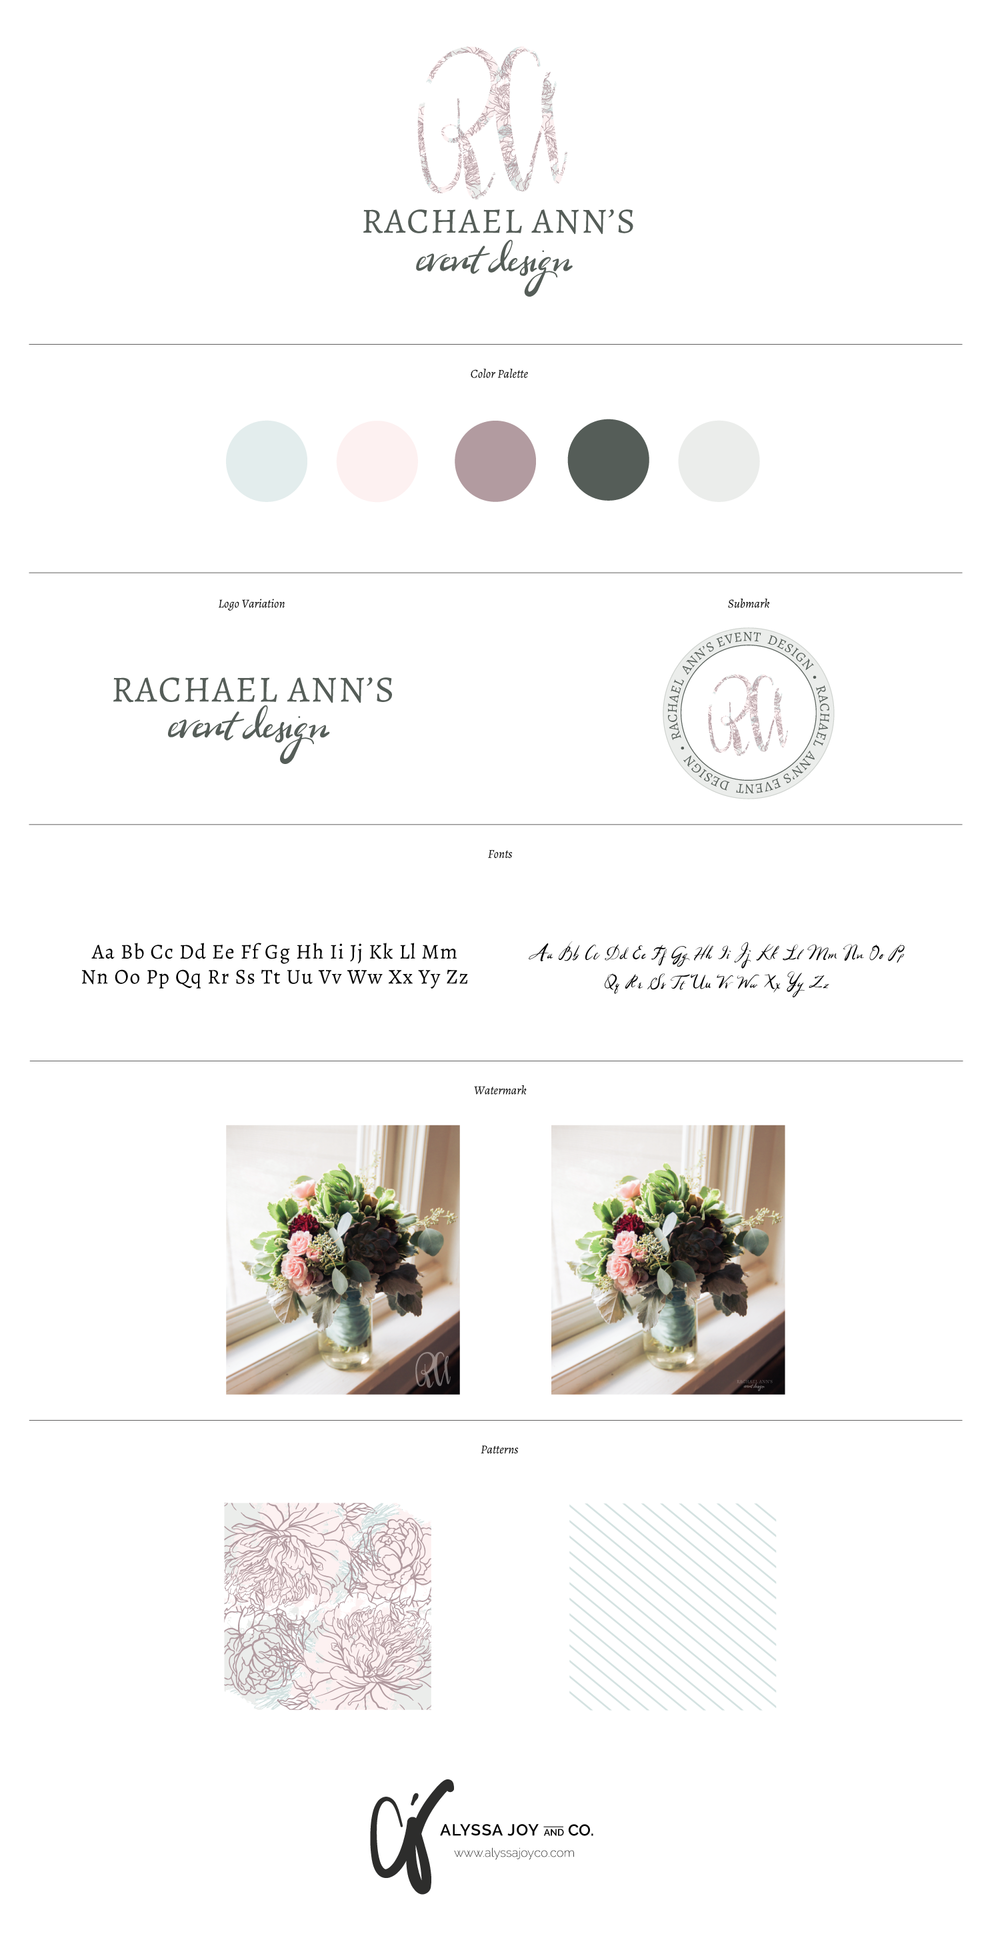 Alyssa Joy & Co. || Branding for Rachael Ann's Event Design